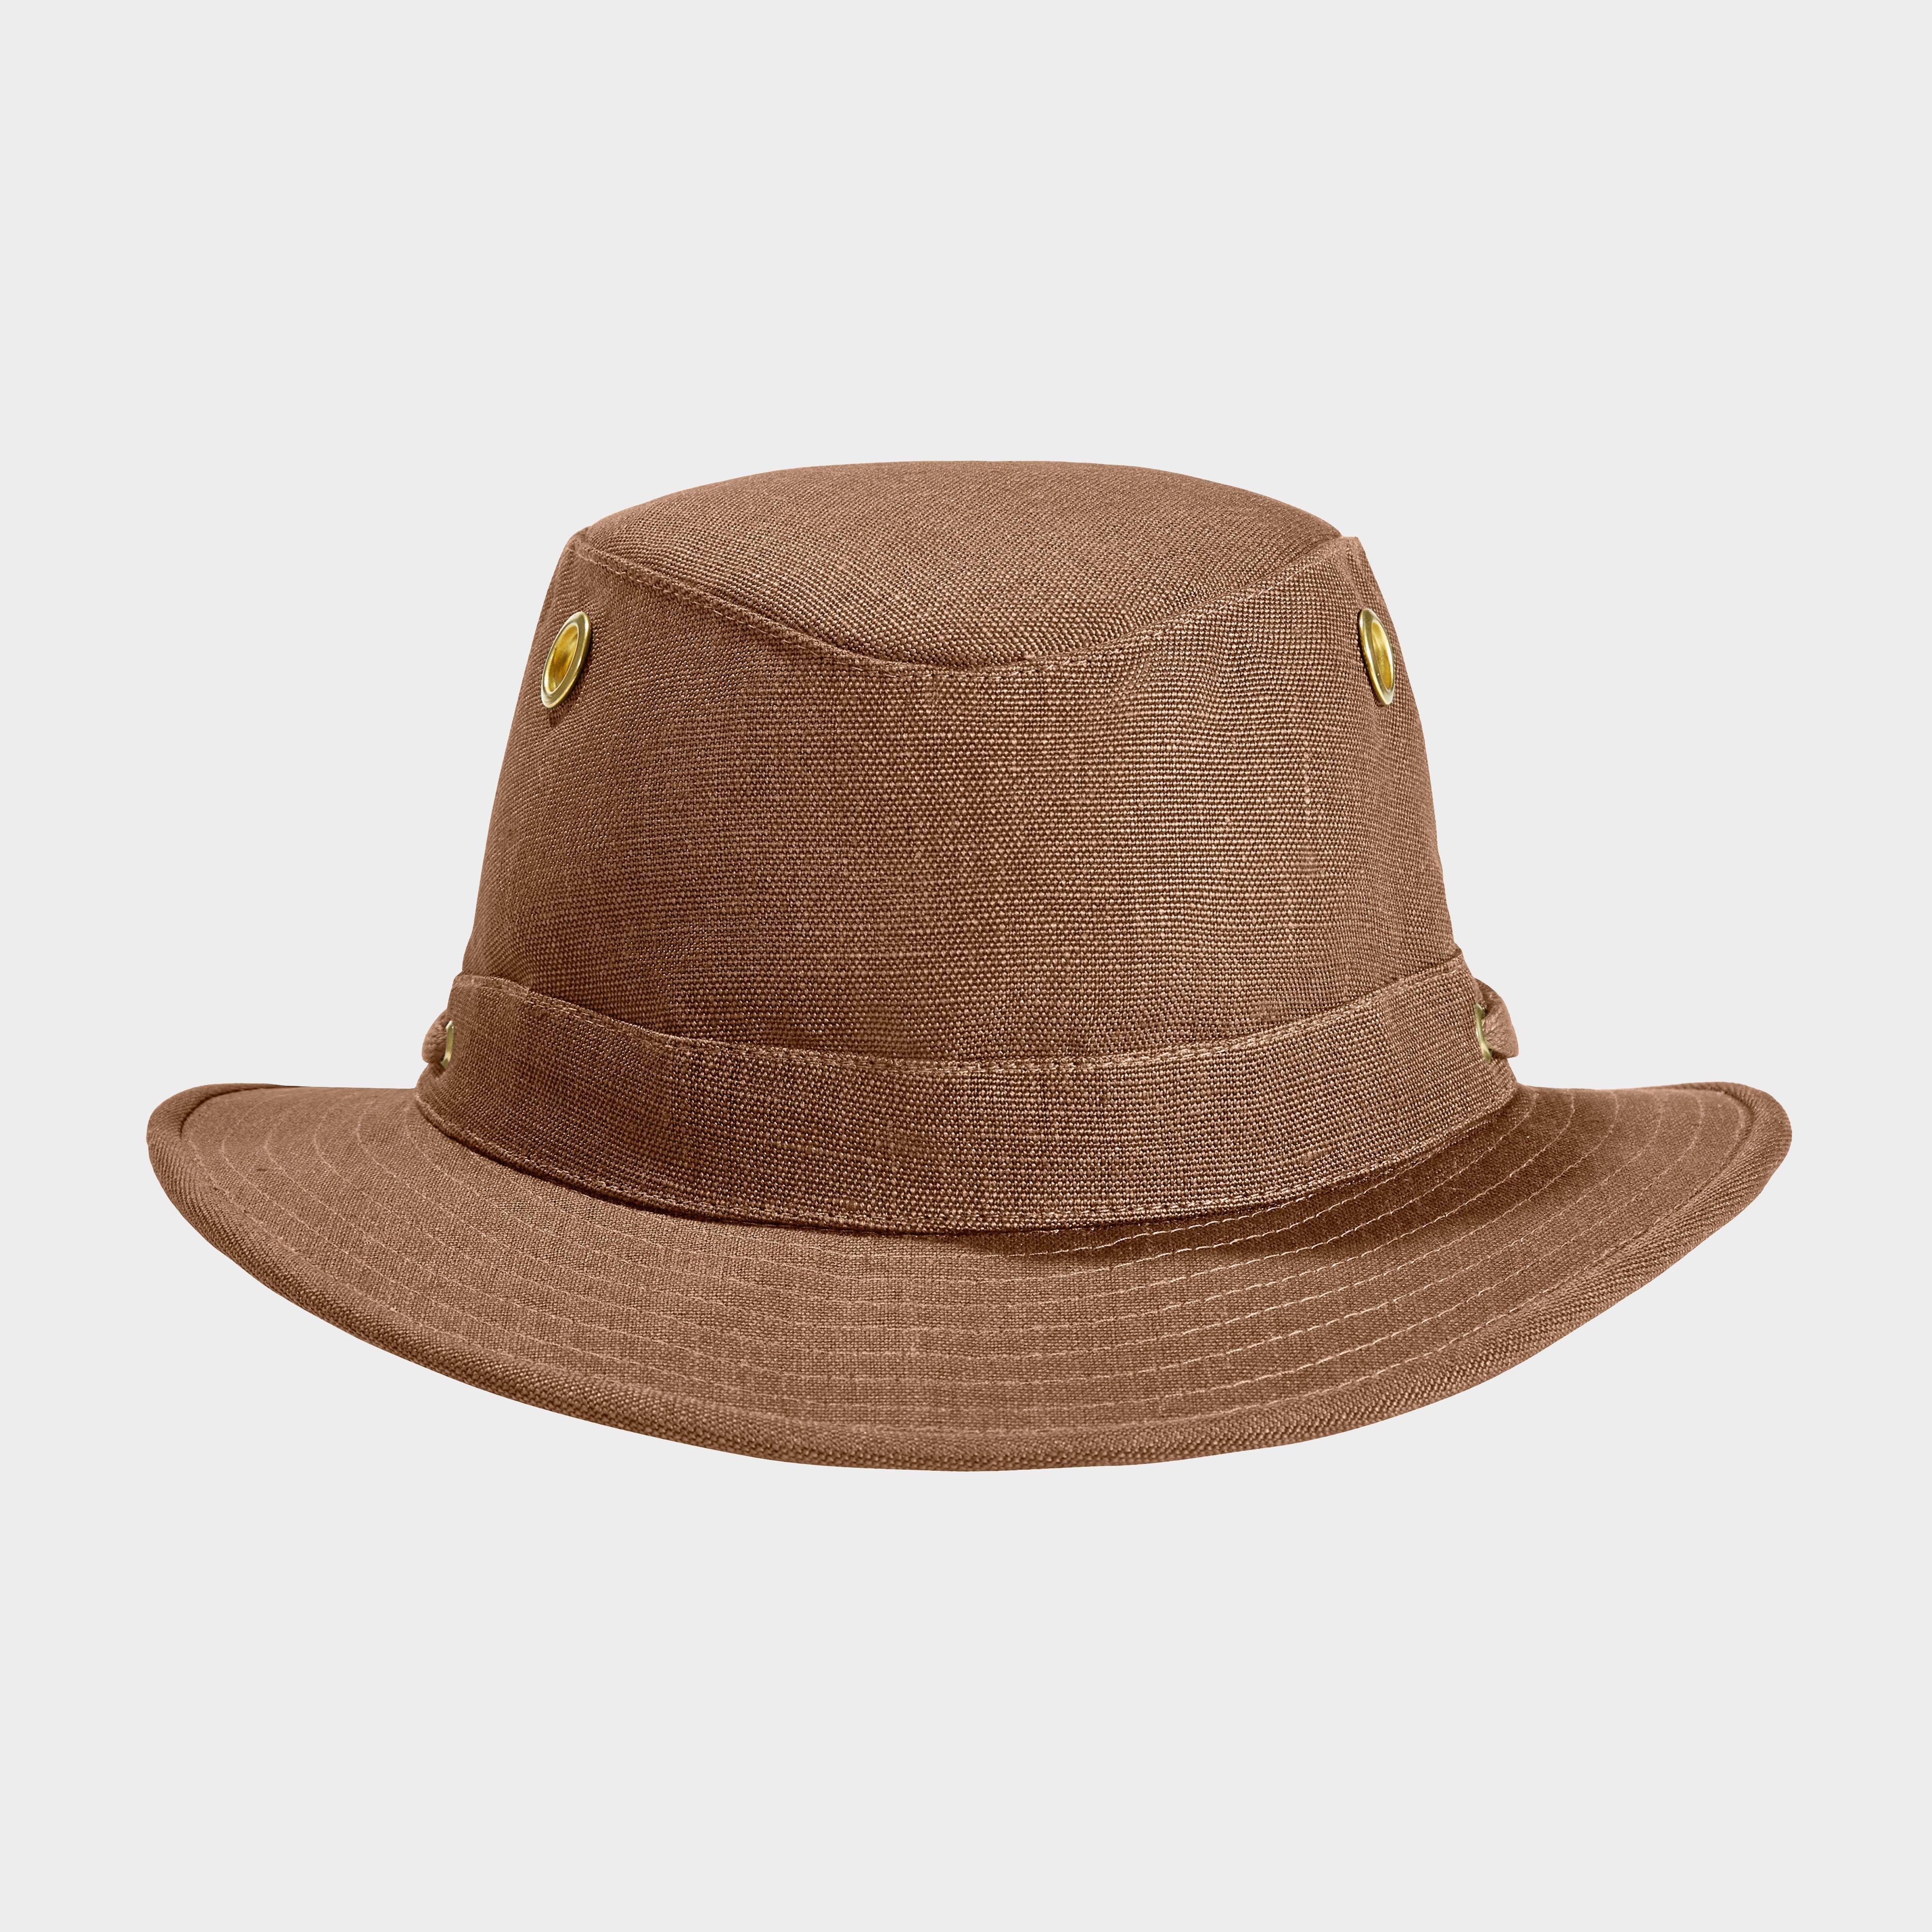 Tilley Th5 Unisex Hemp Brow Hat - Brown, Brown